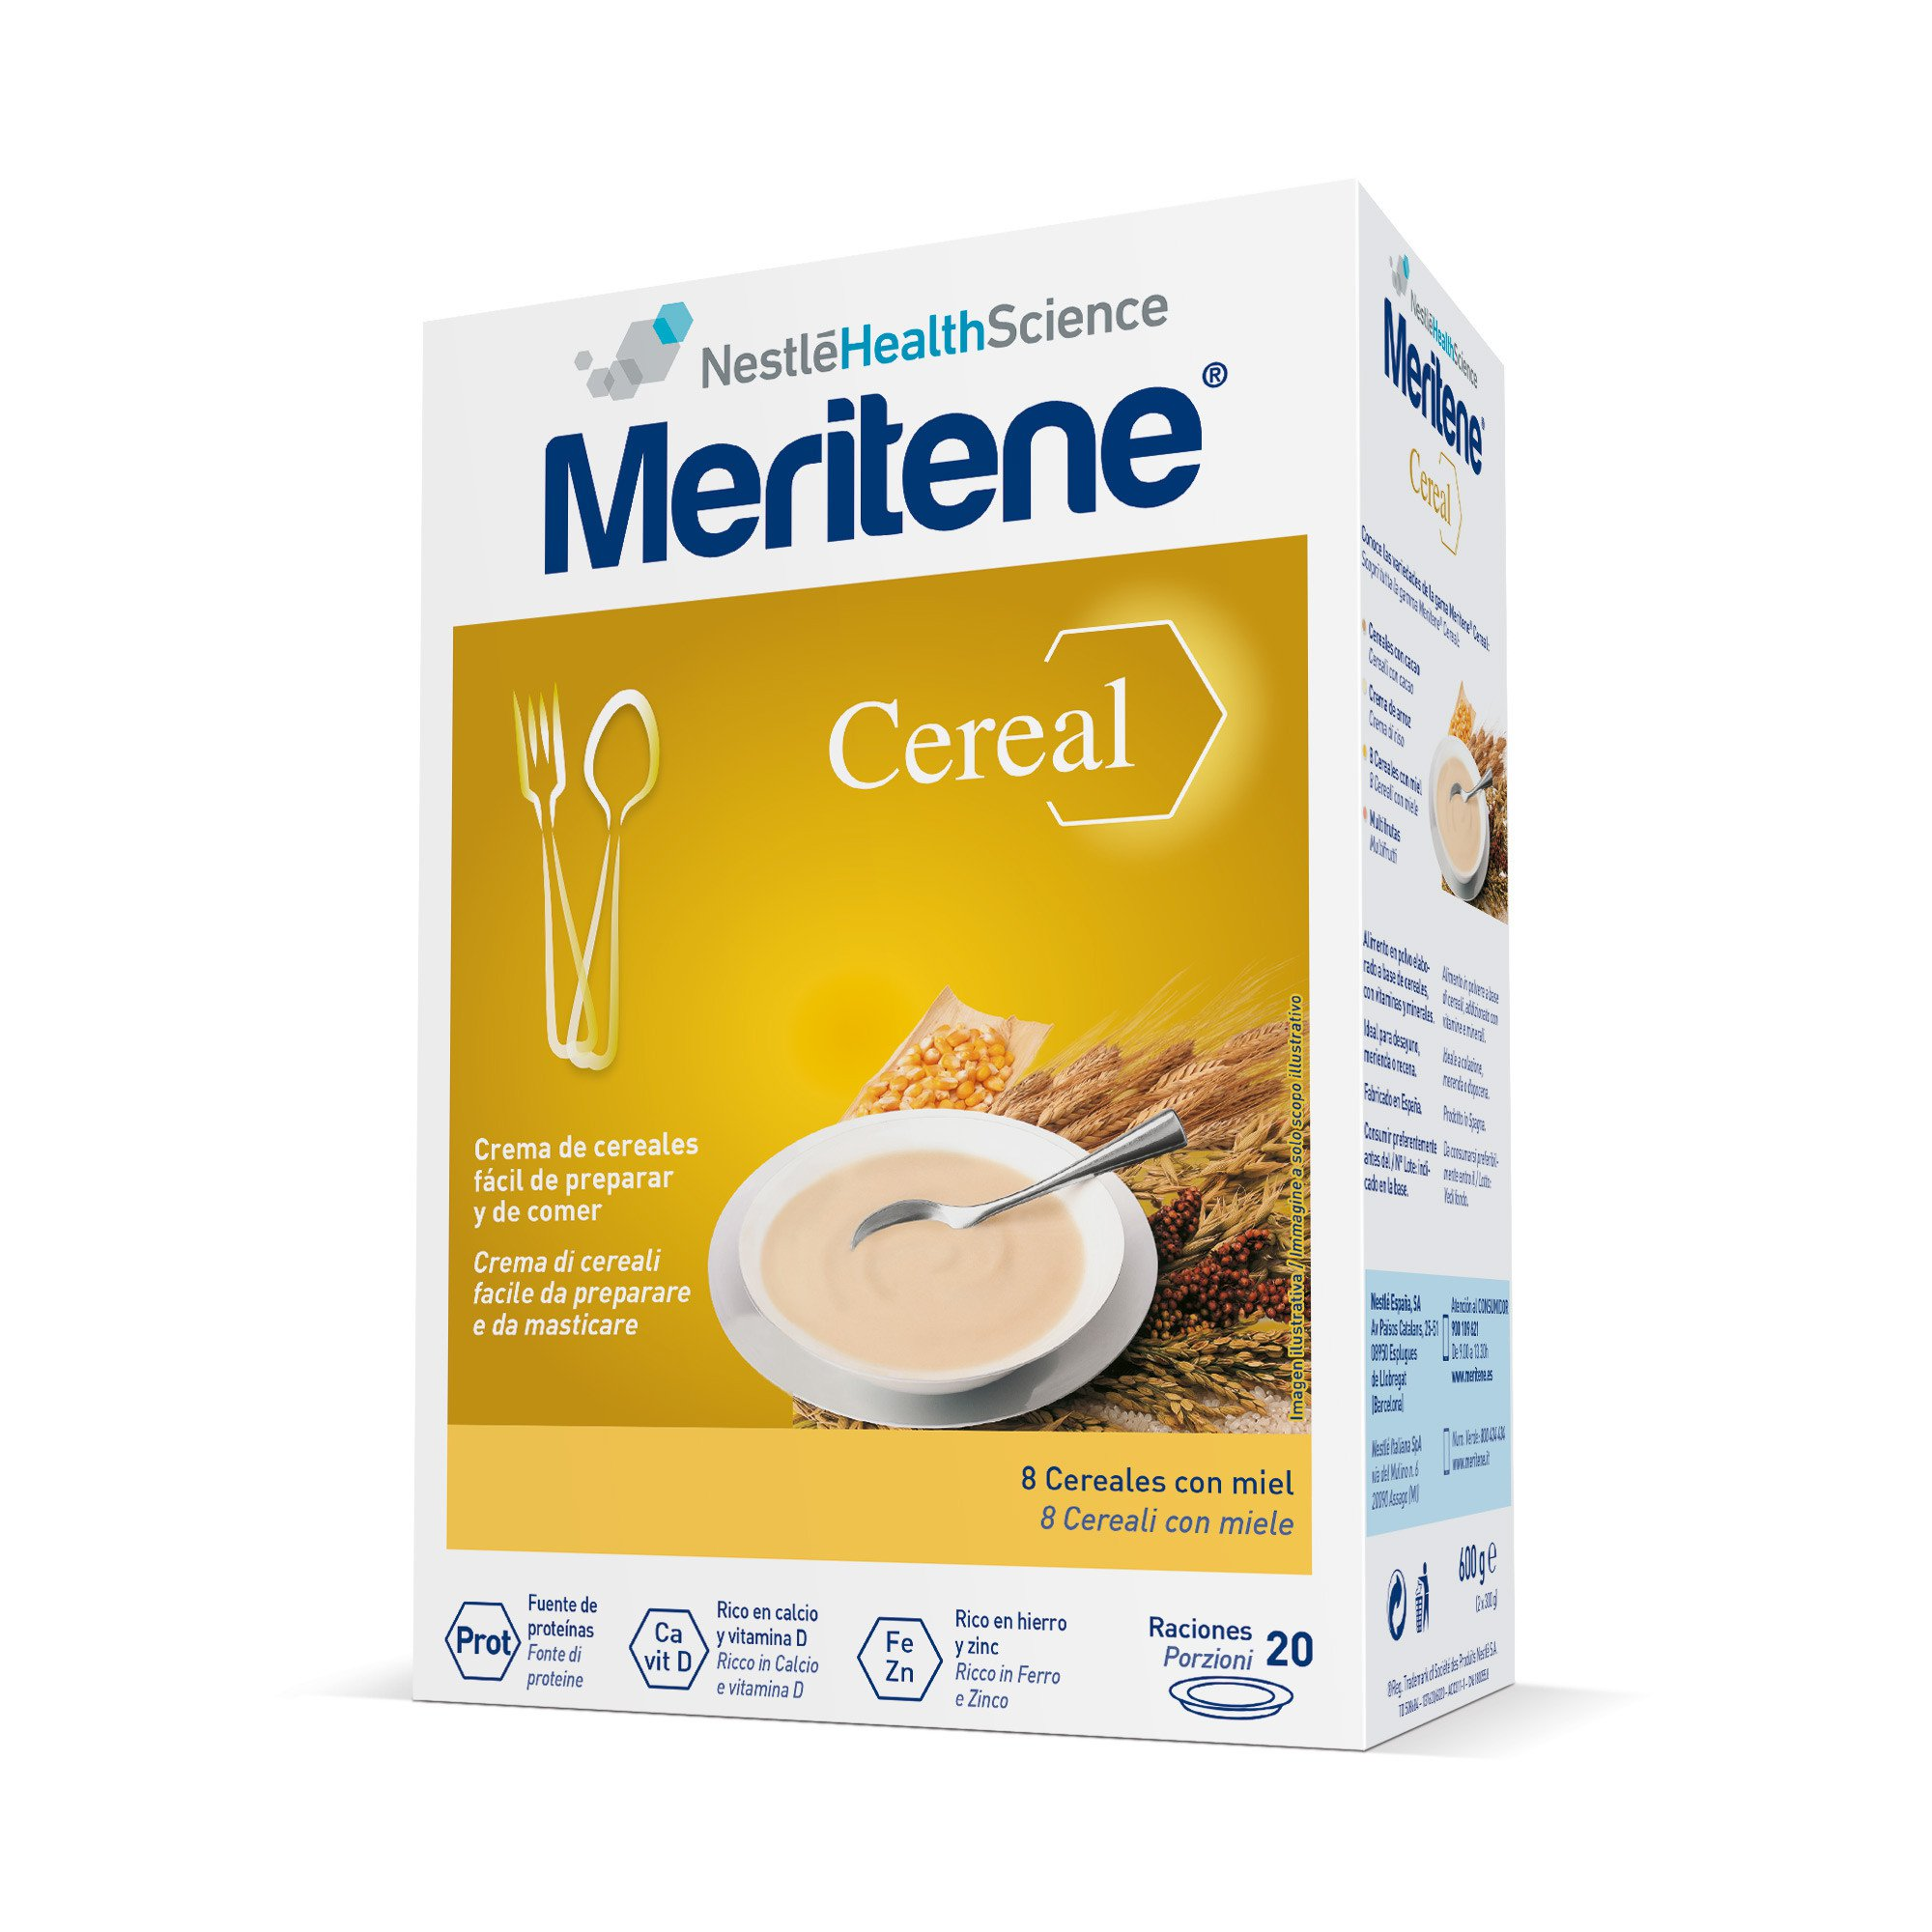 Meritene Cereali 8 Miele Istantaneo 600g